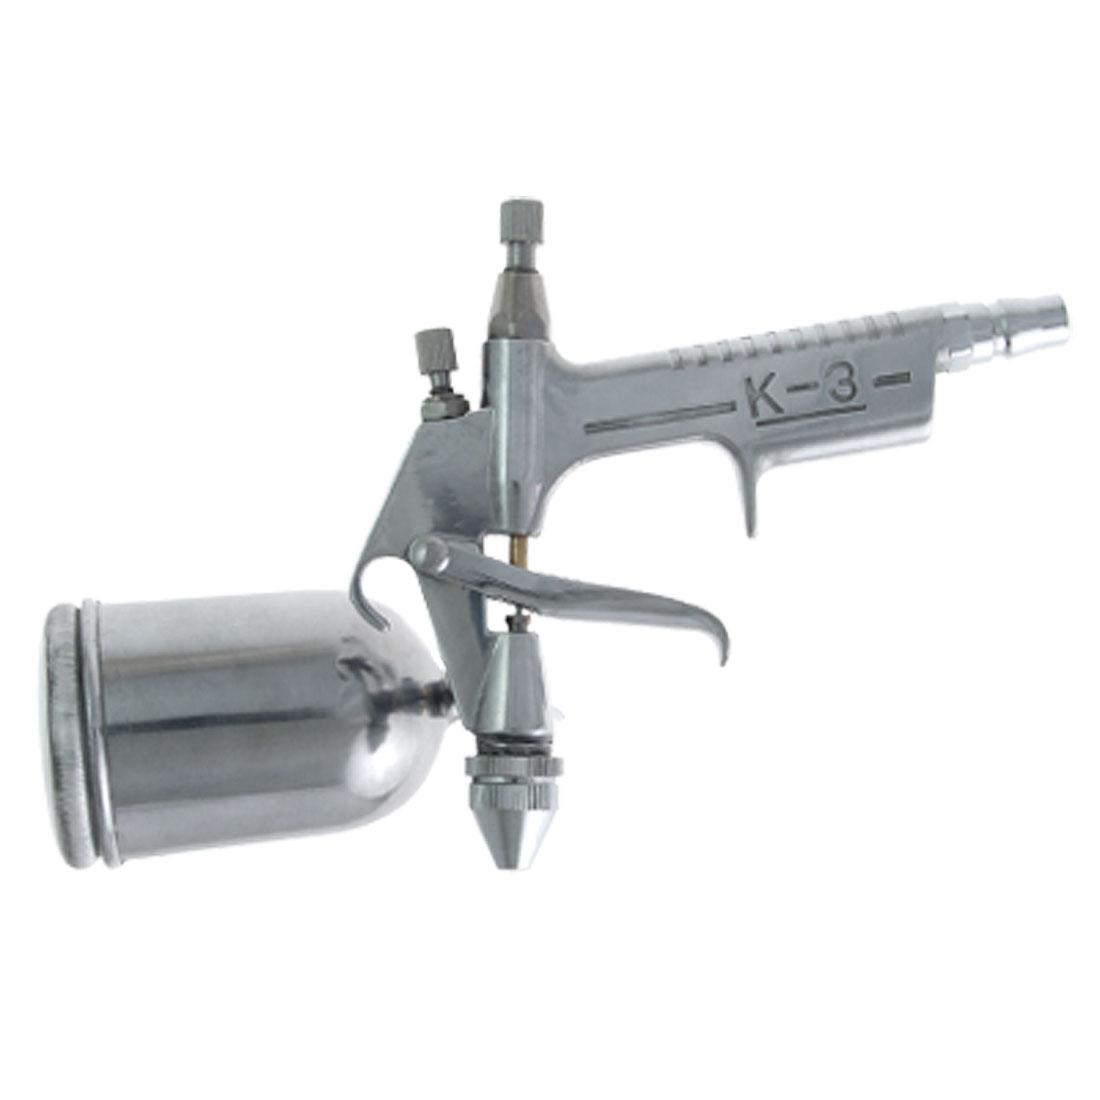 Mini 0.5 K3 HVLP Gravity Feed Paint Spray Gun Airbrush